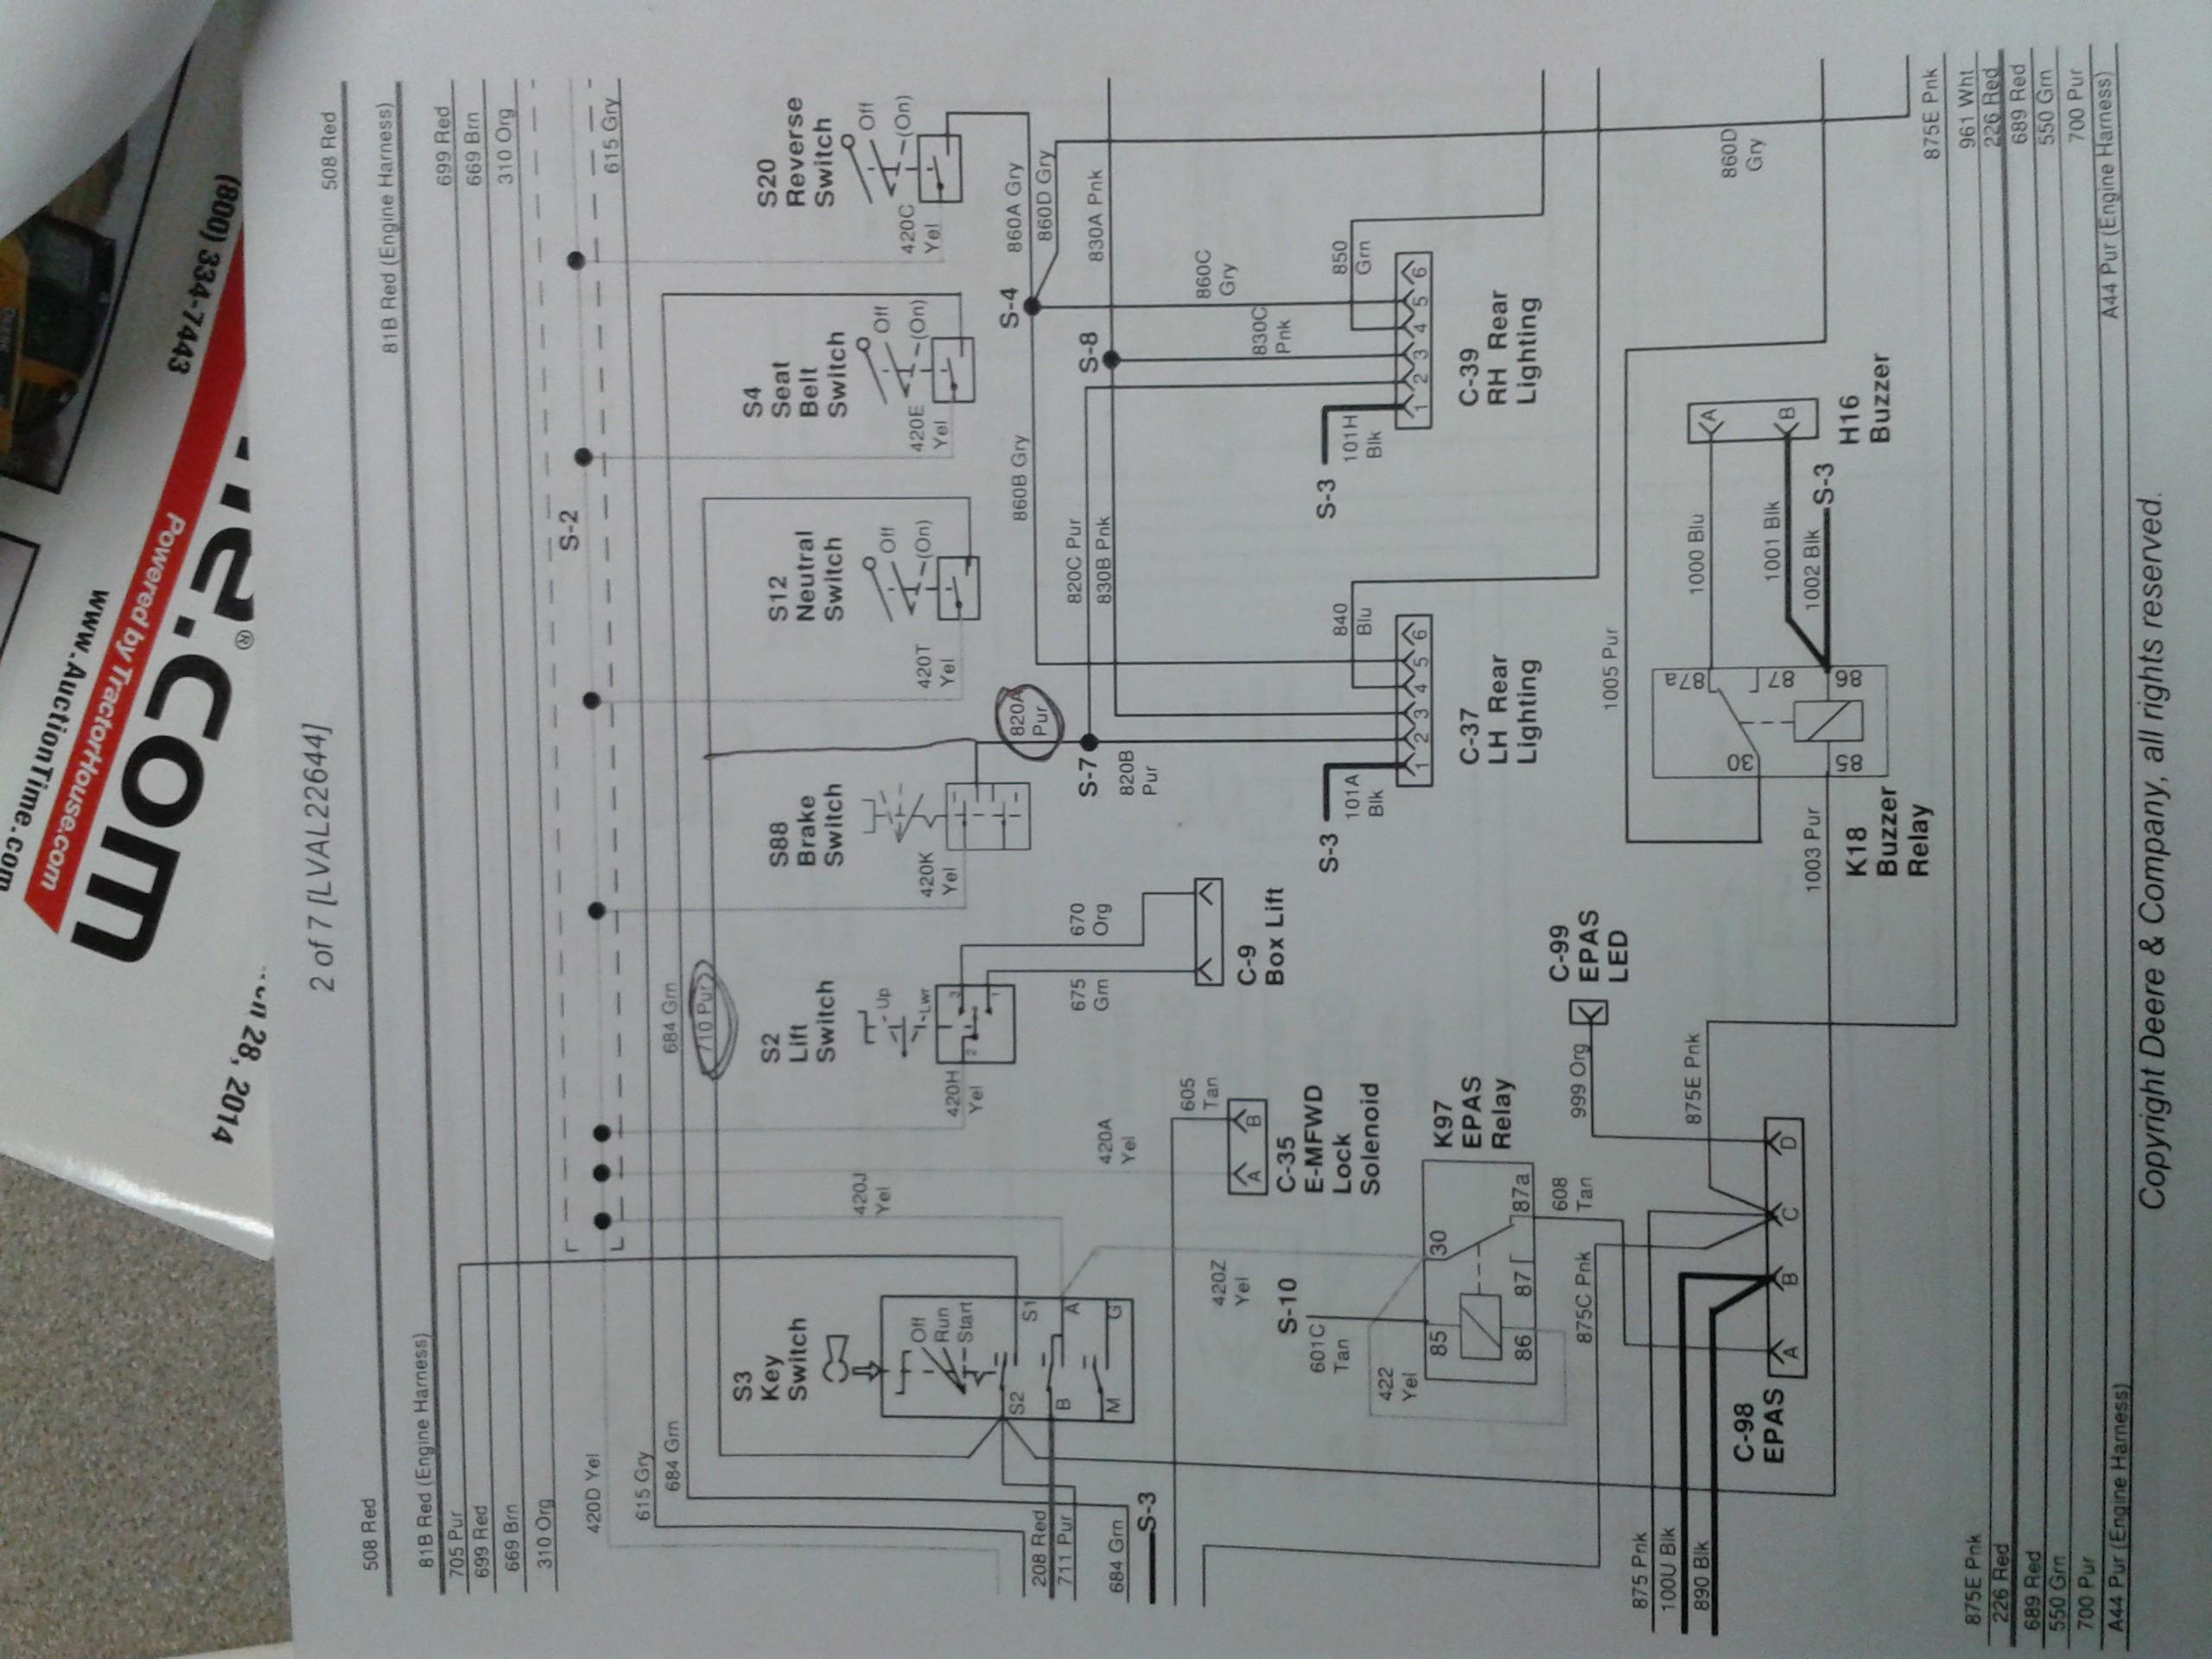 hpx wiring diagram product wiring diagrams u2022 rh genesisventures us  peg perego gator hpx wiring diagram